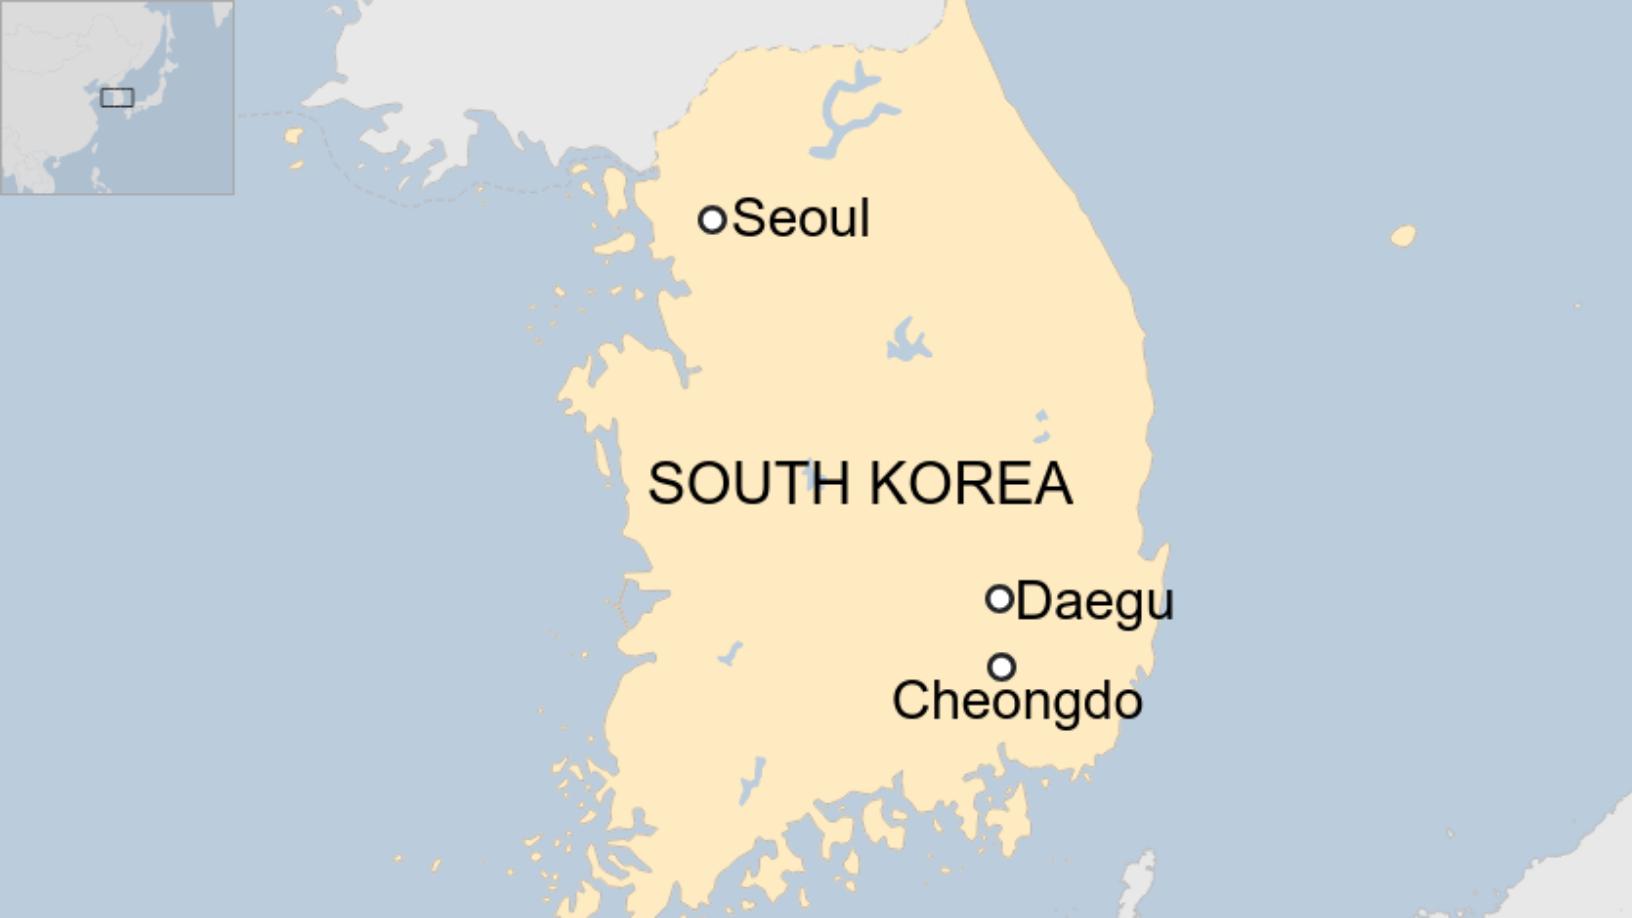 nearly500newcovid19casesreportedinsouthkorea